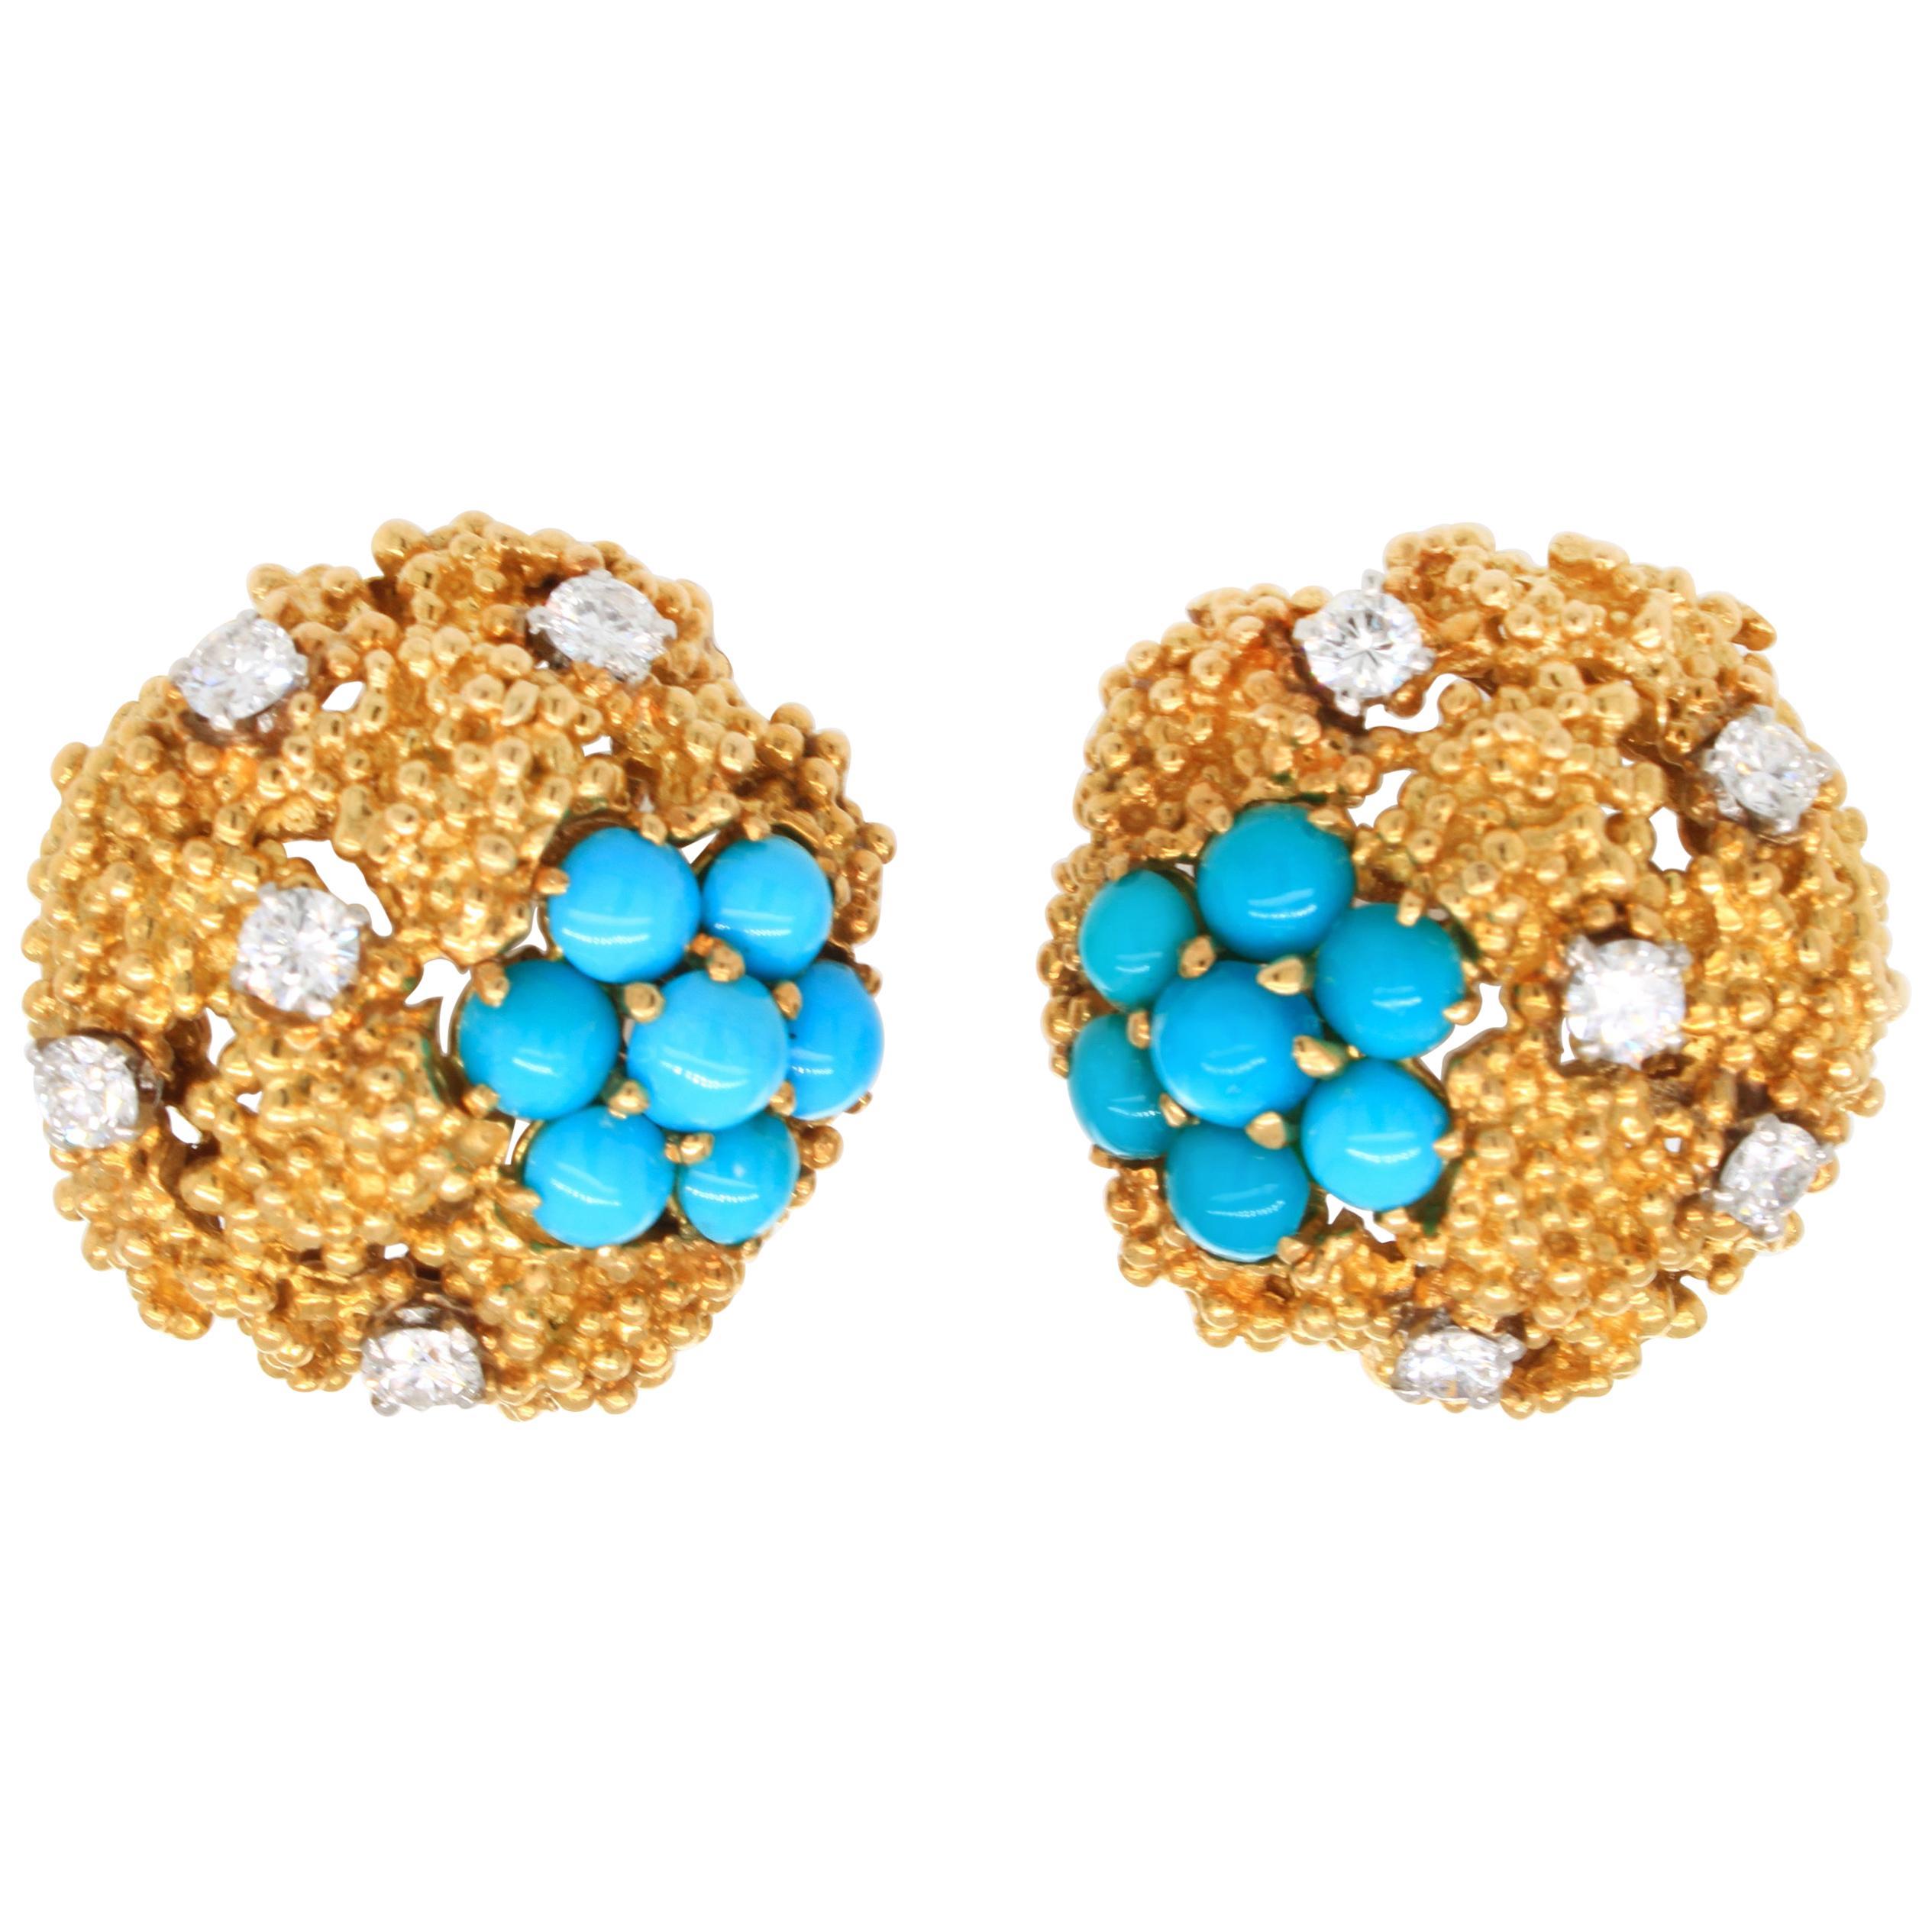 Boucheron Turqouise and Diamond Gold Nugget Earrings, 1940s